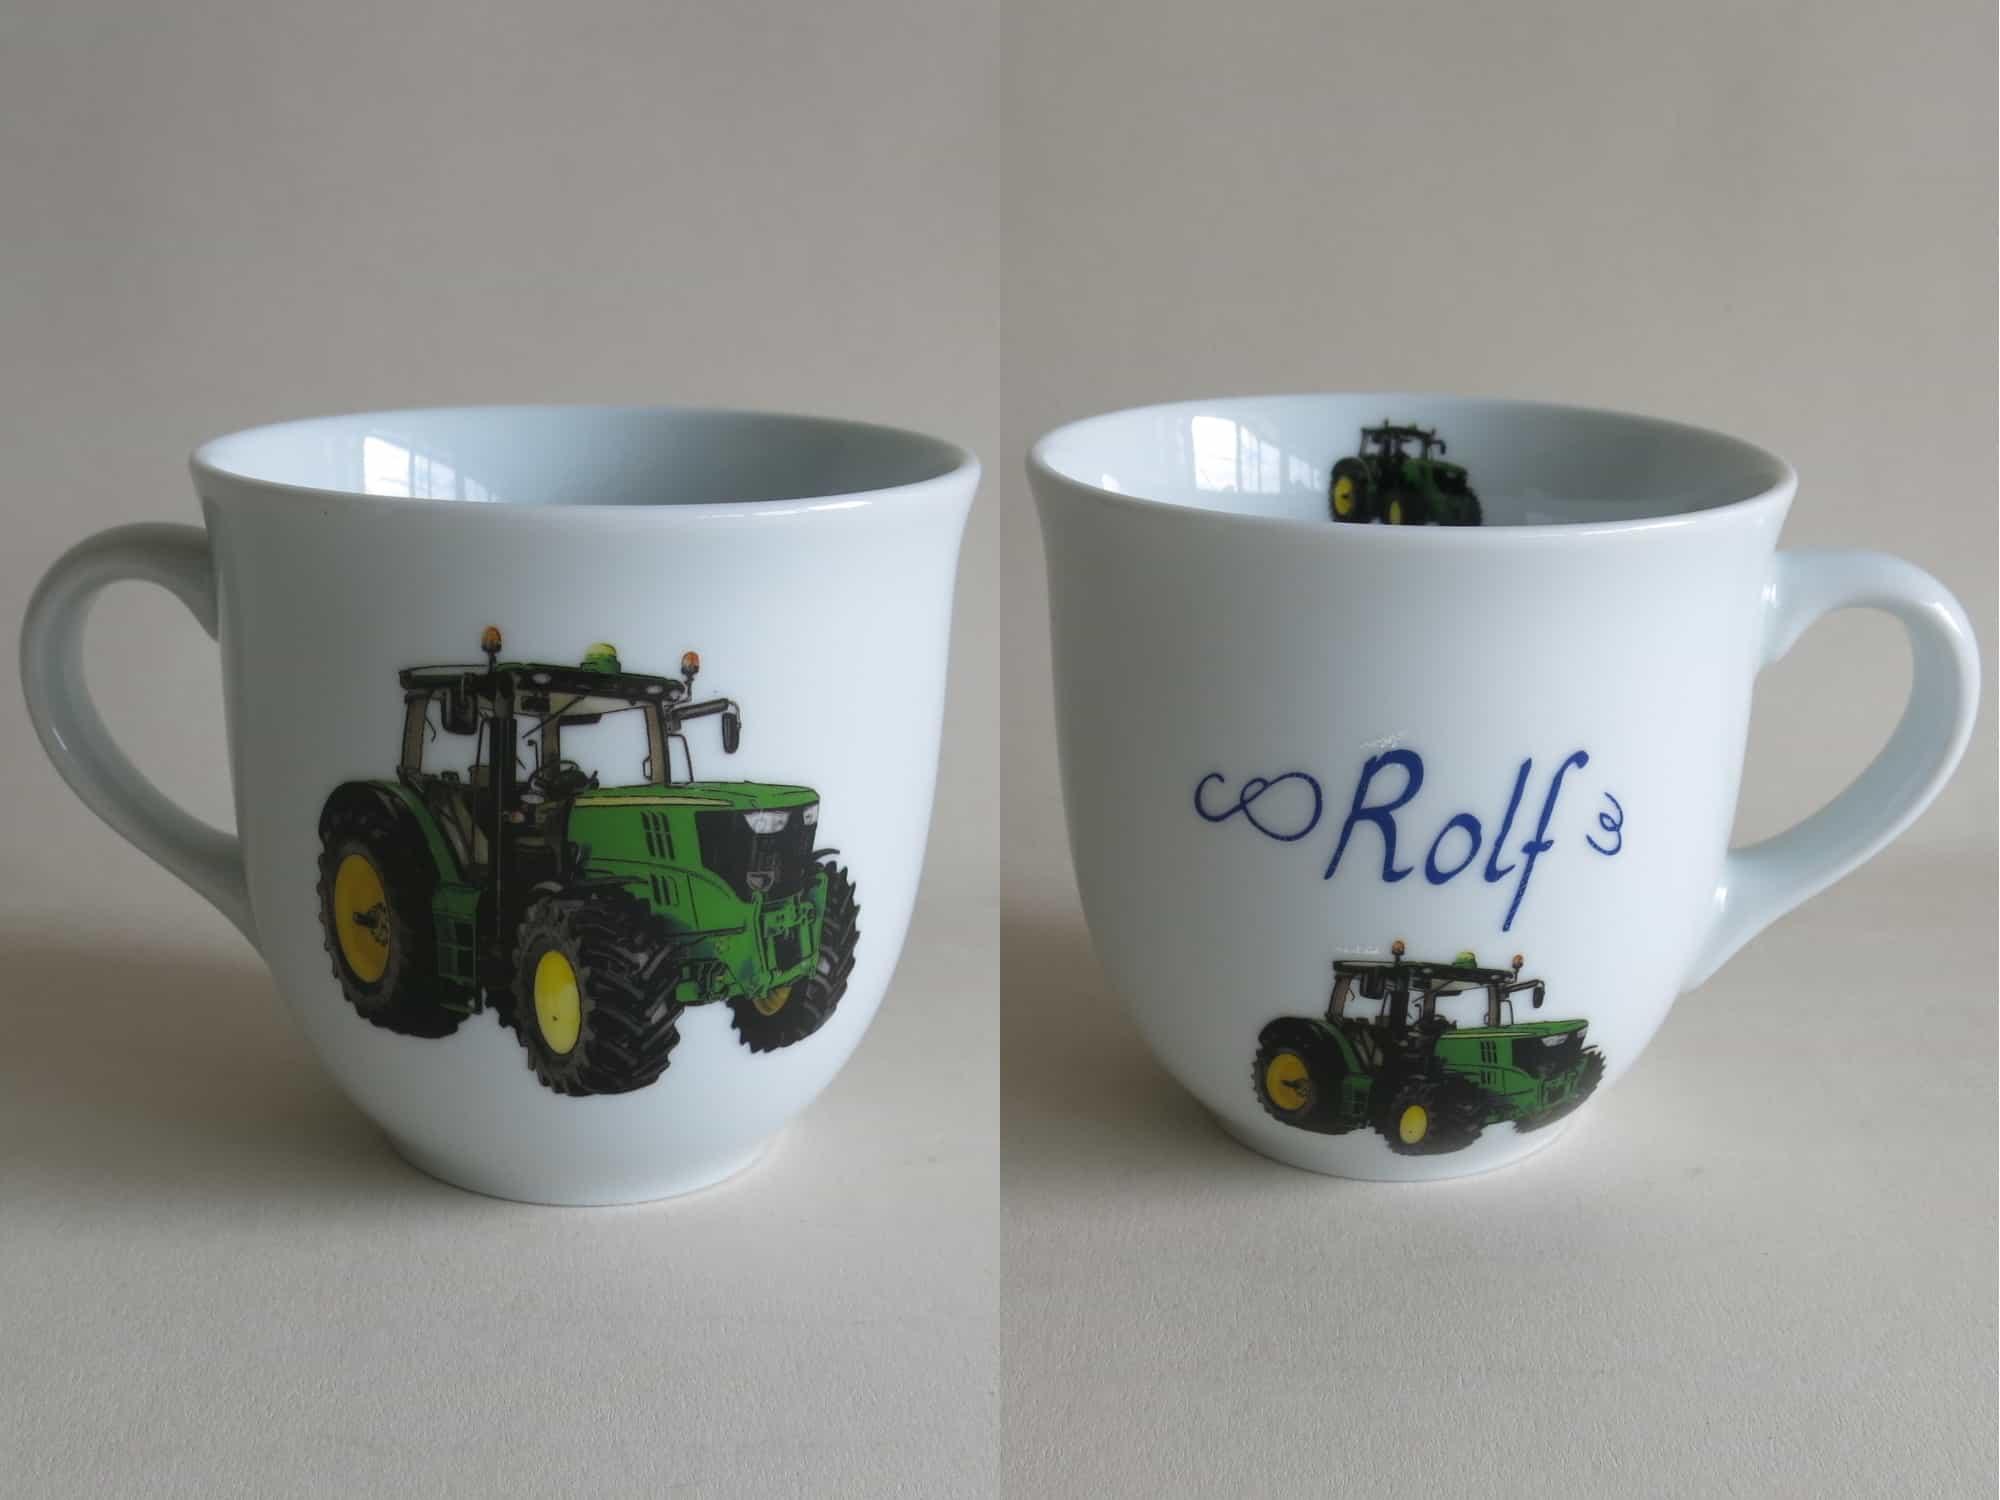 Frühstücksgeschirr Porzellan großer Becher 400ml mit grünem Traktor und Namen